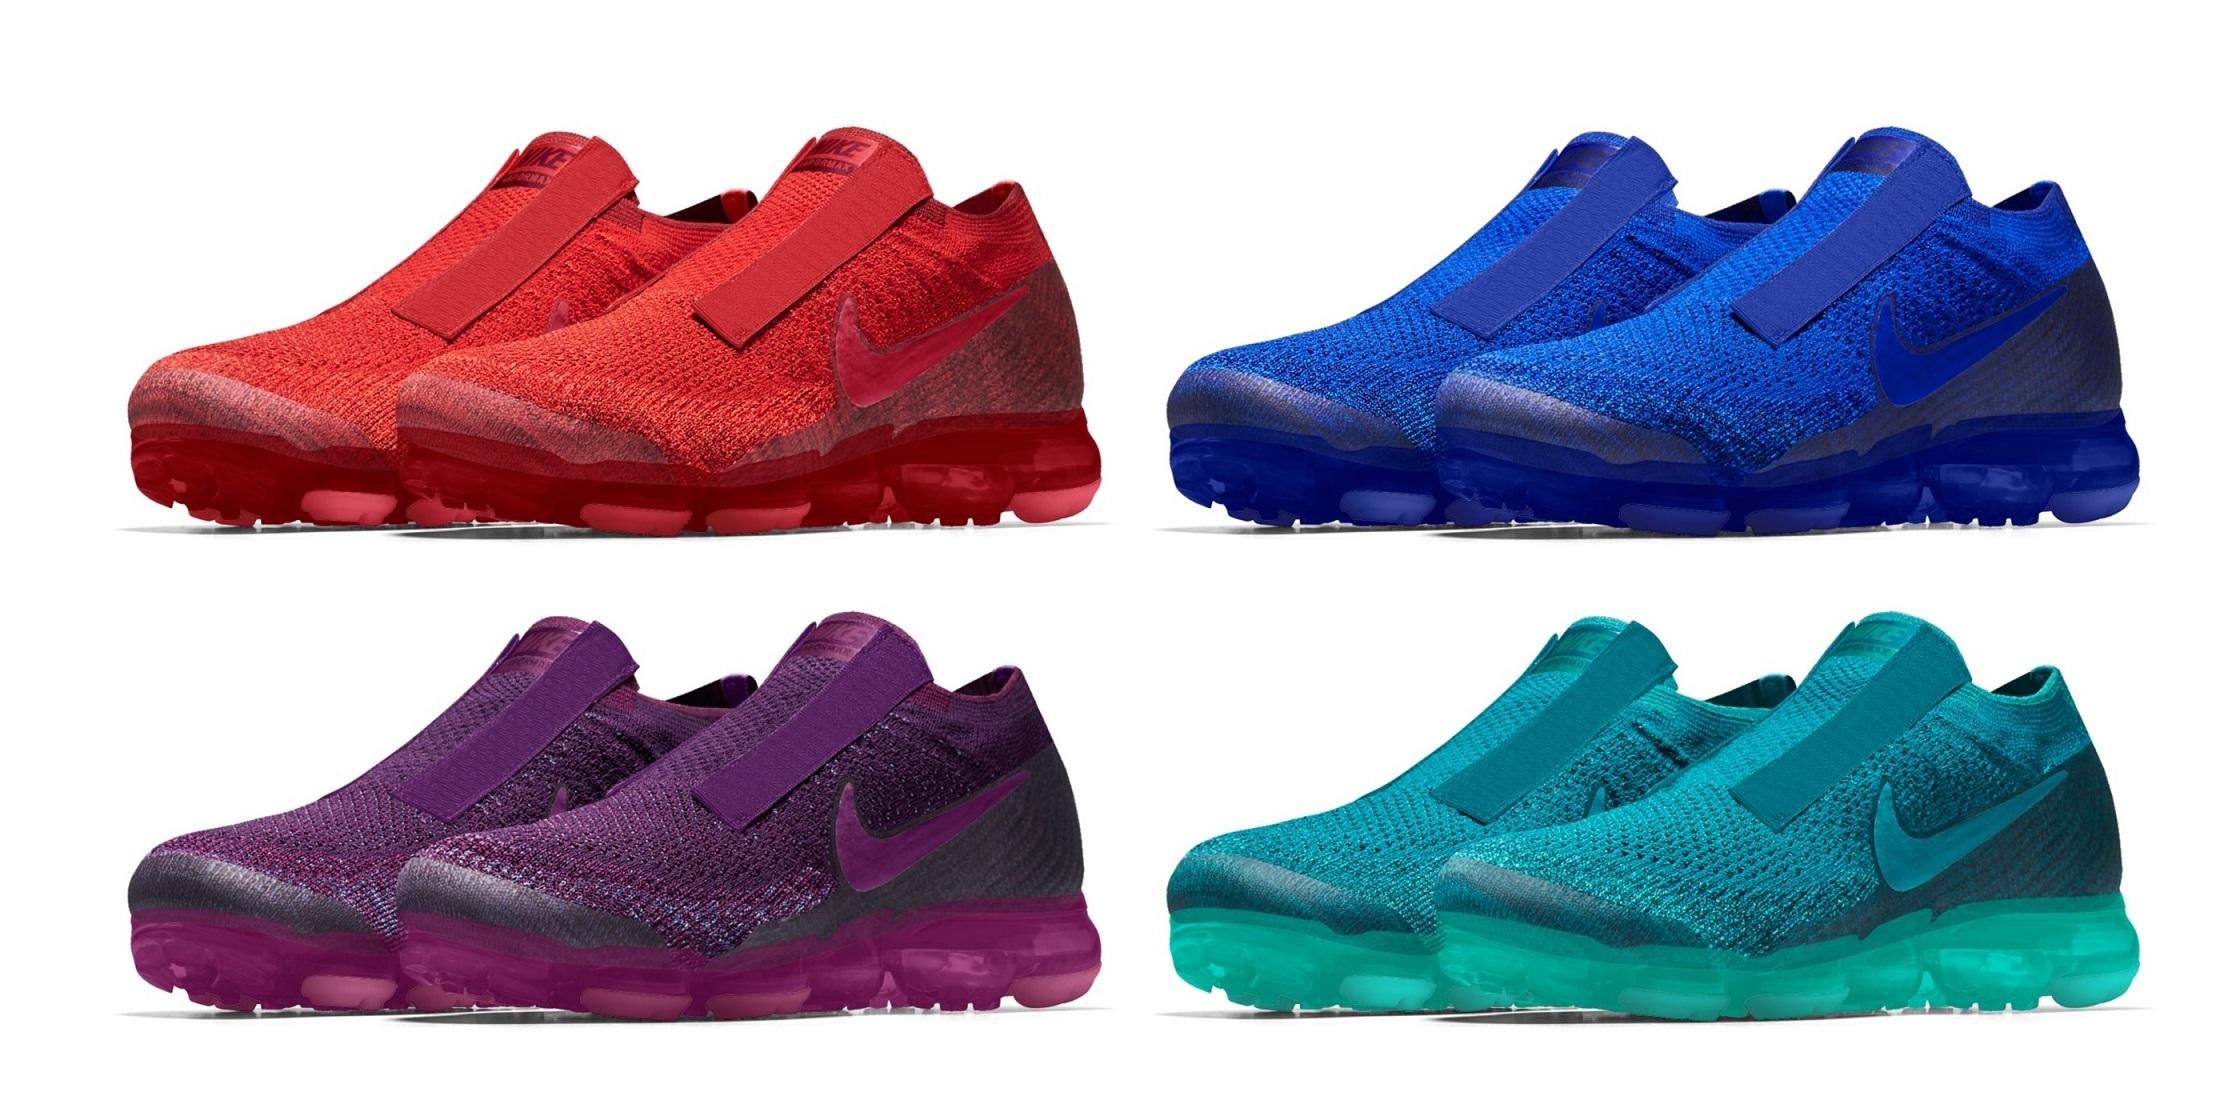 check out 70e92 a9e10 新聞分享/ Nike Air VaporMax Flyknit SE 登陸NIKEiD 客製系統 ...